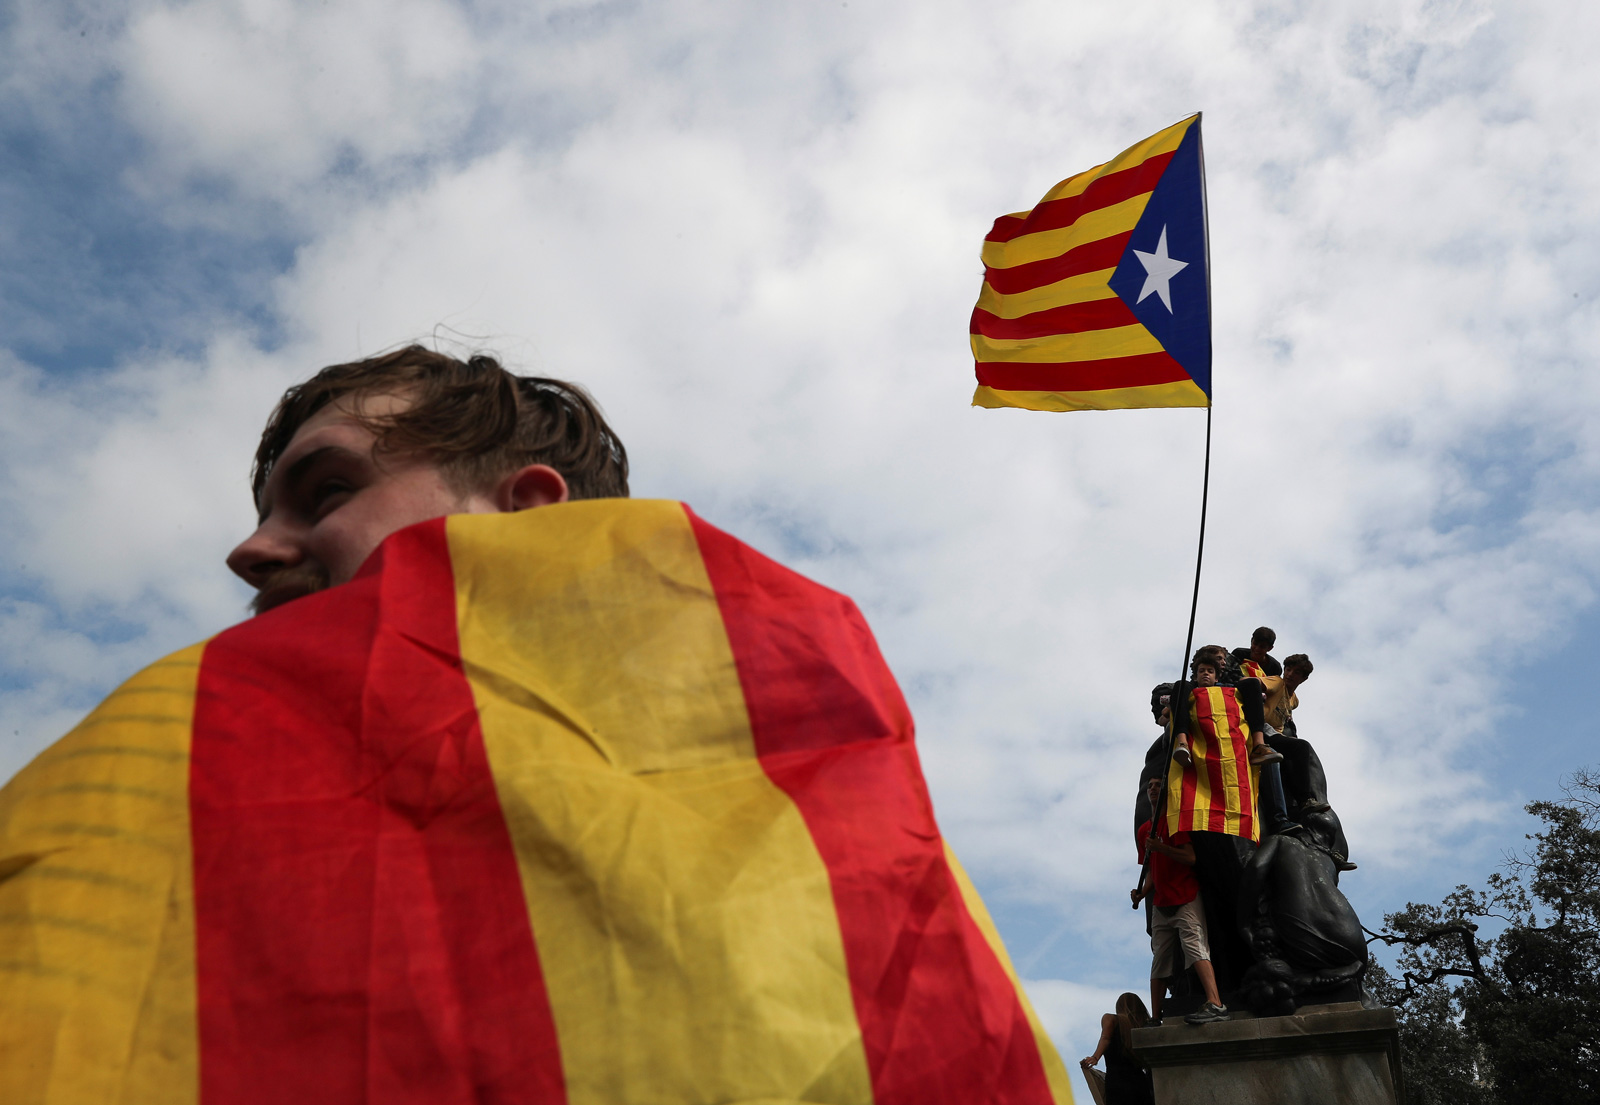 People wave a Catalan separatist flag after the banned independence referendum in Barcelona, October 2, 2017